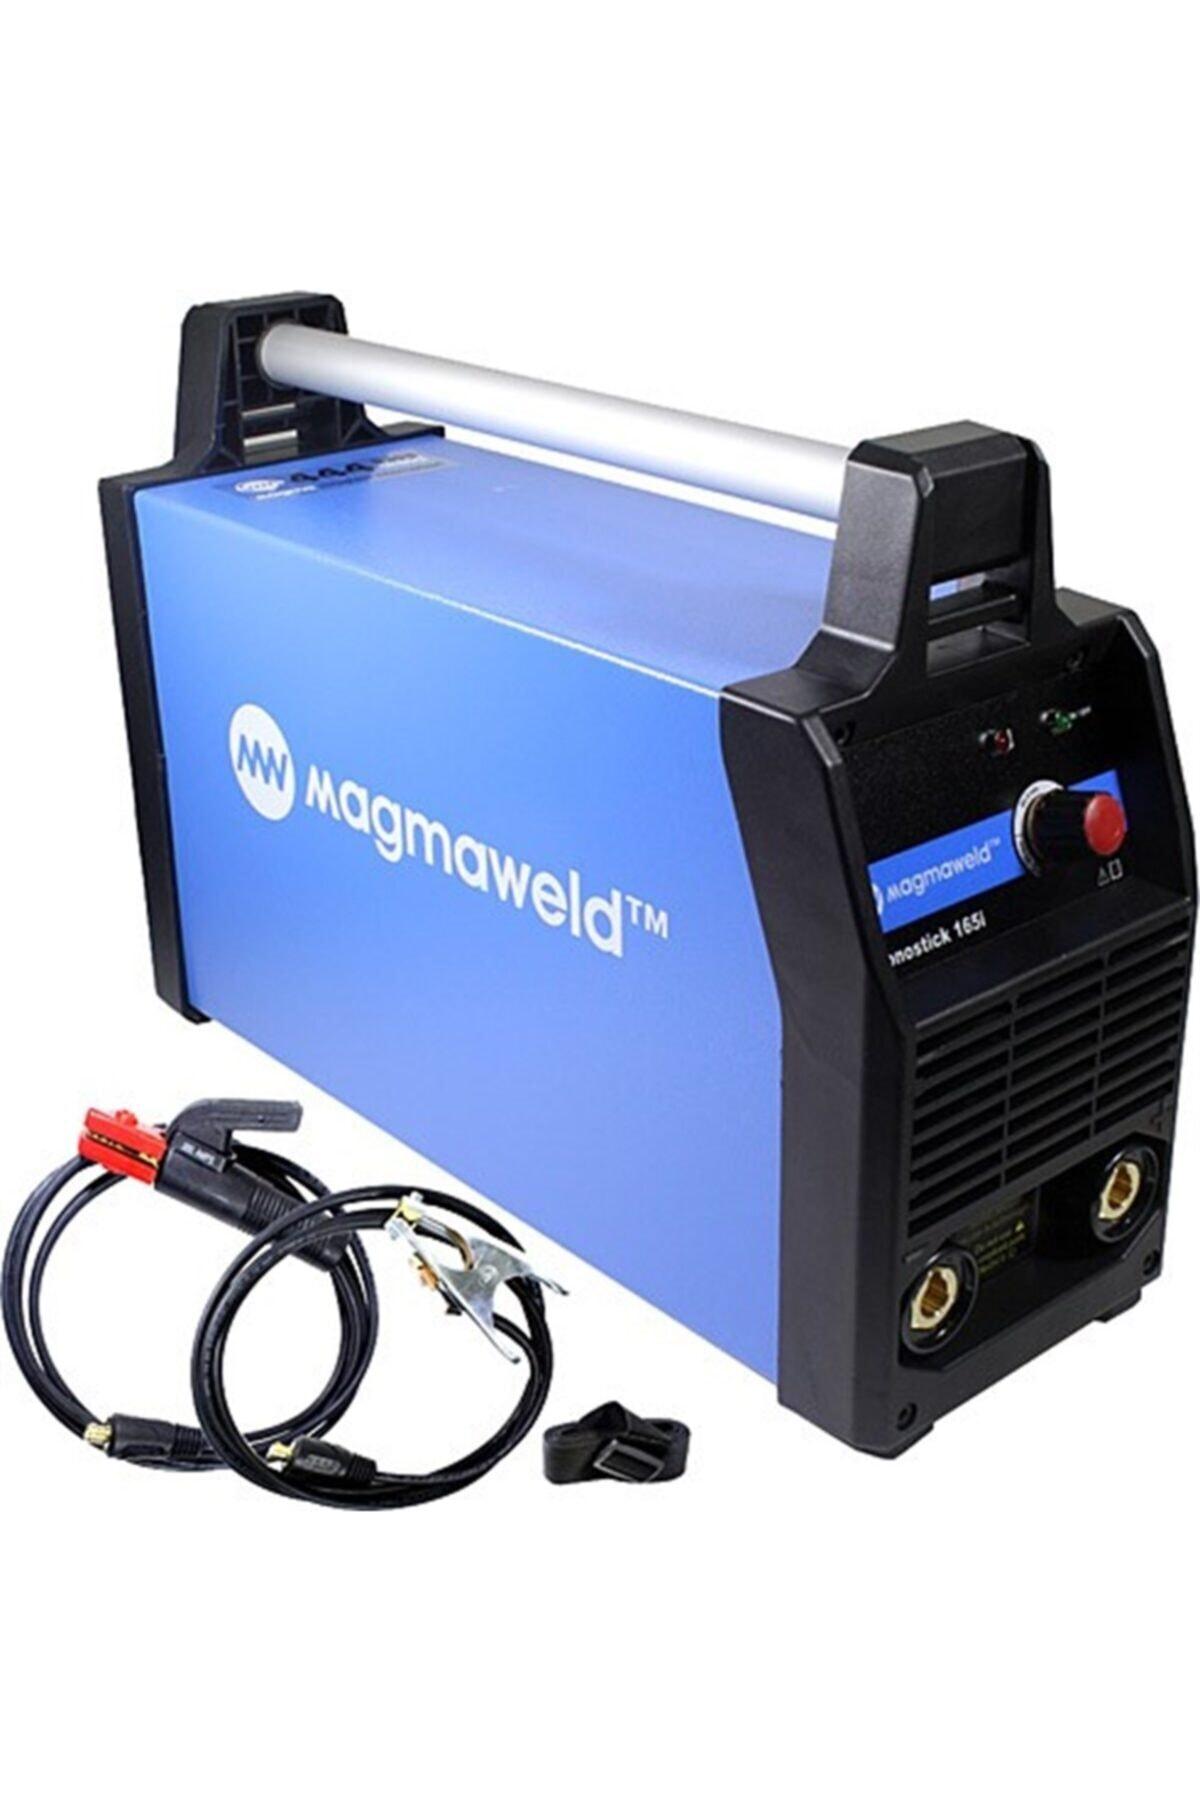 Magmaweld Ministick 165 Amper Inventer Kaynak Makinesi 2